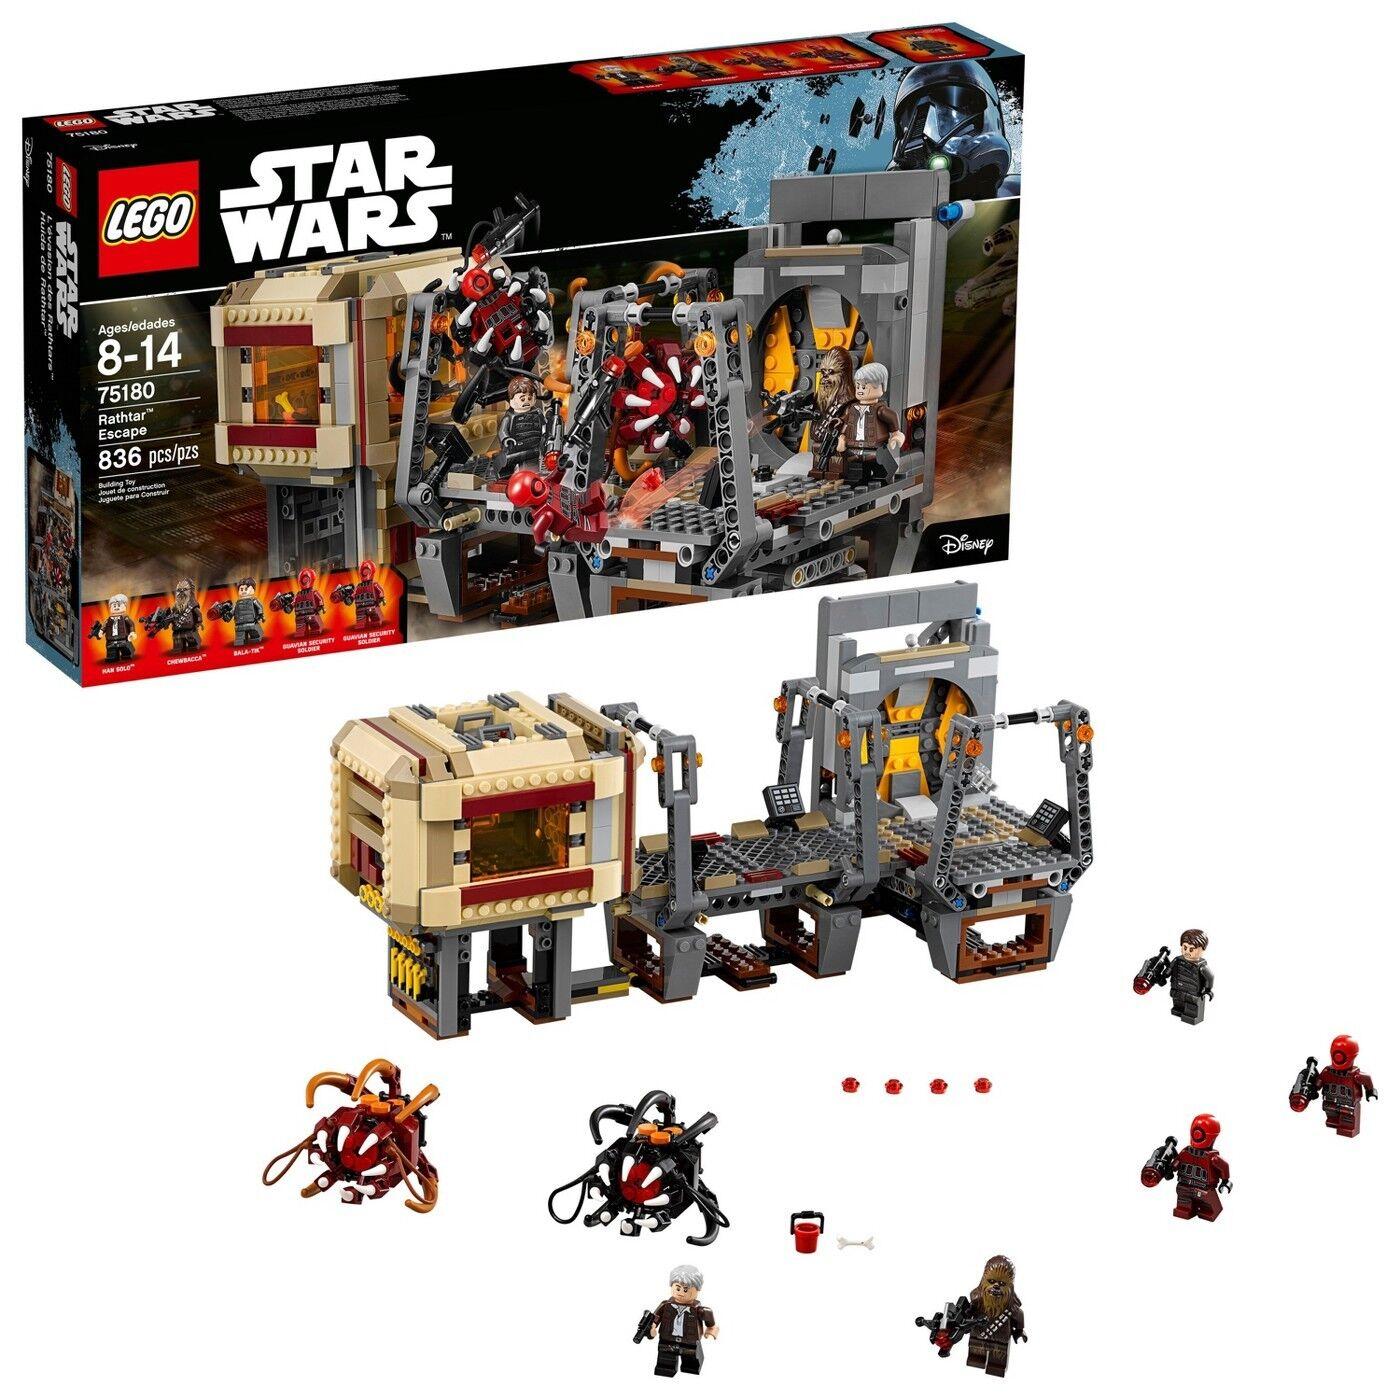 Neuf Lego 75180 Star Wars Rathtar Evasion Han Solo Chewbacca Bala-Tik